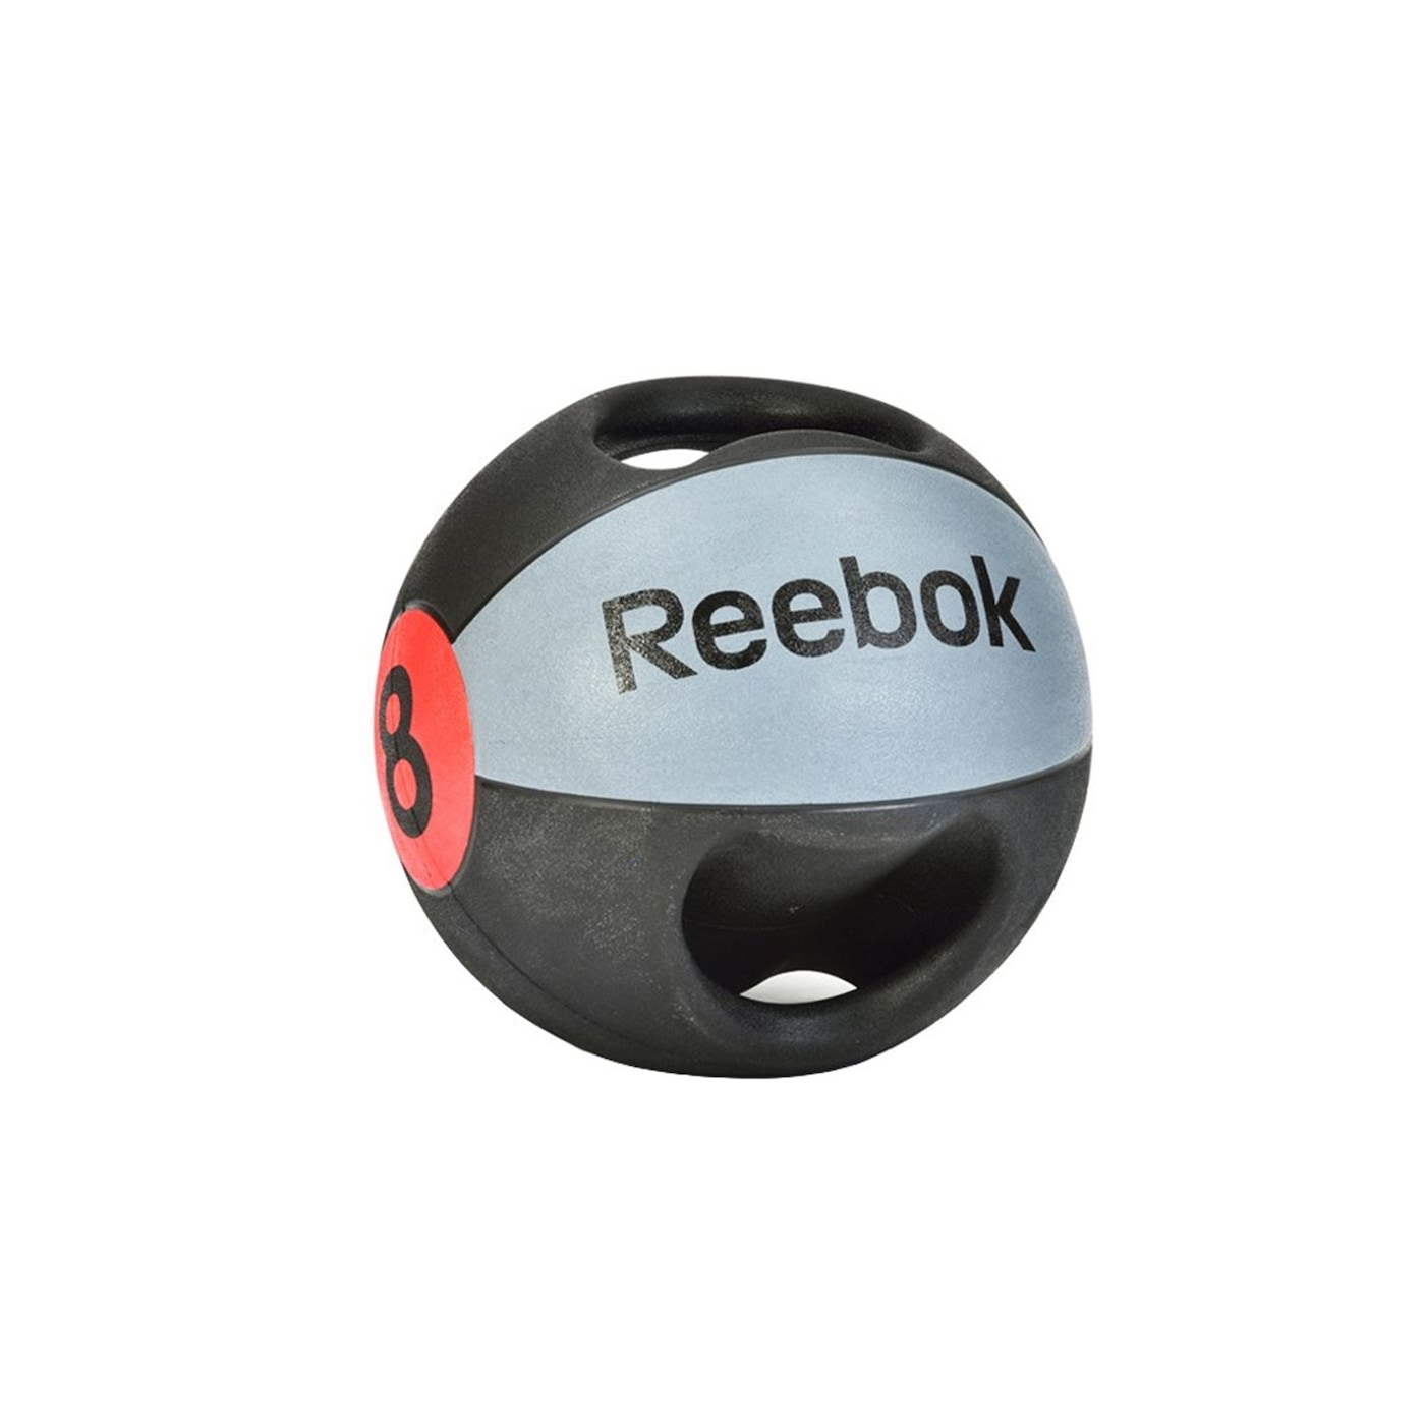 Reebok 8kg Medicine Ball